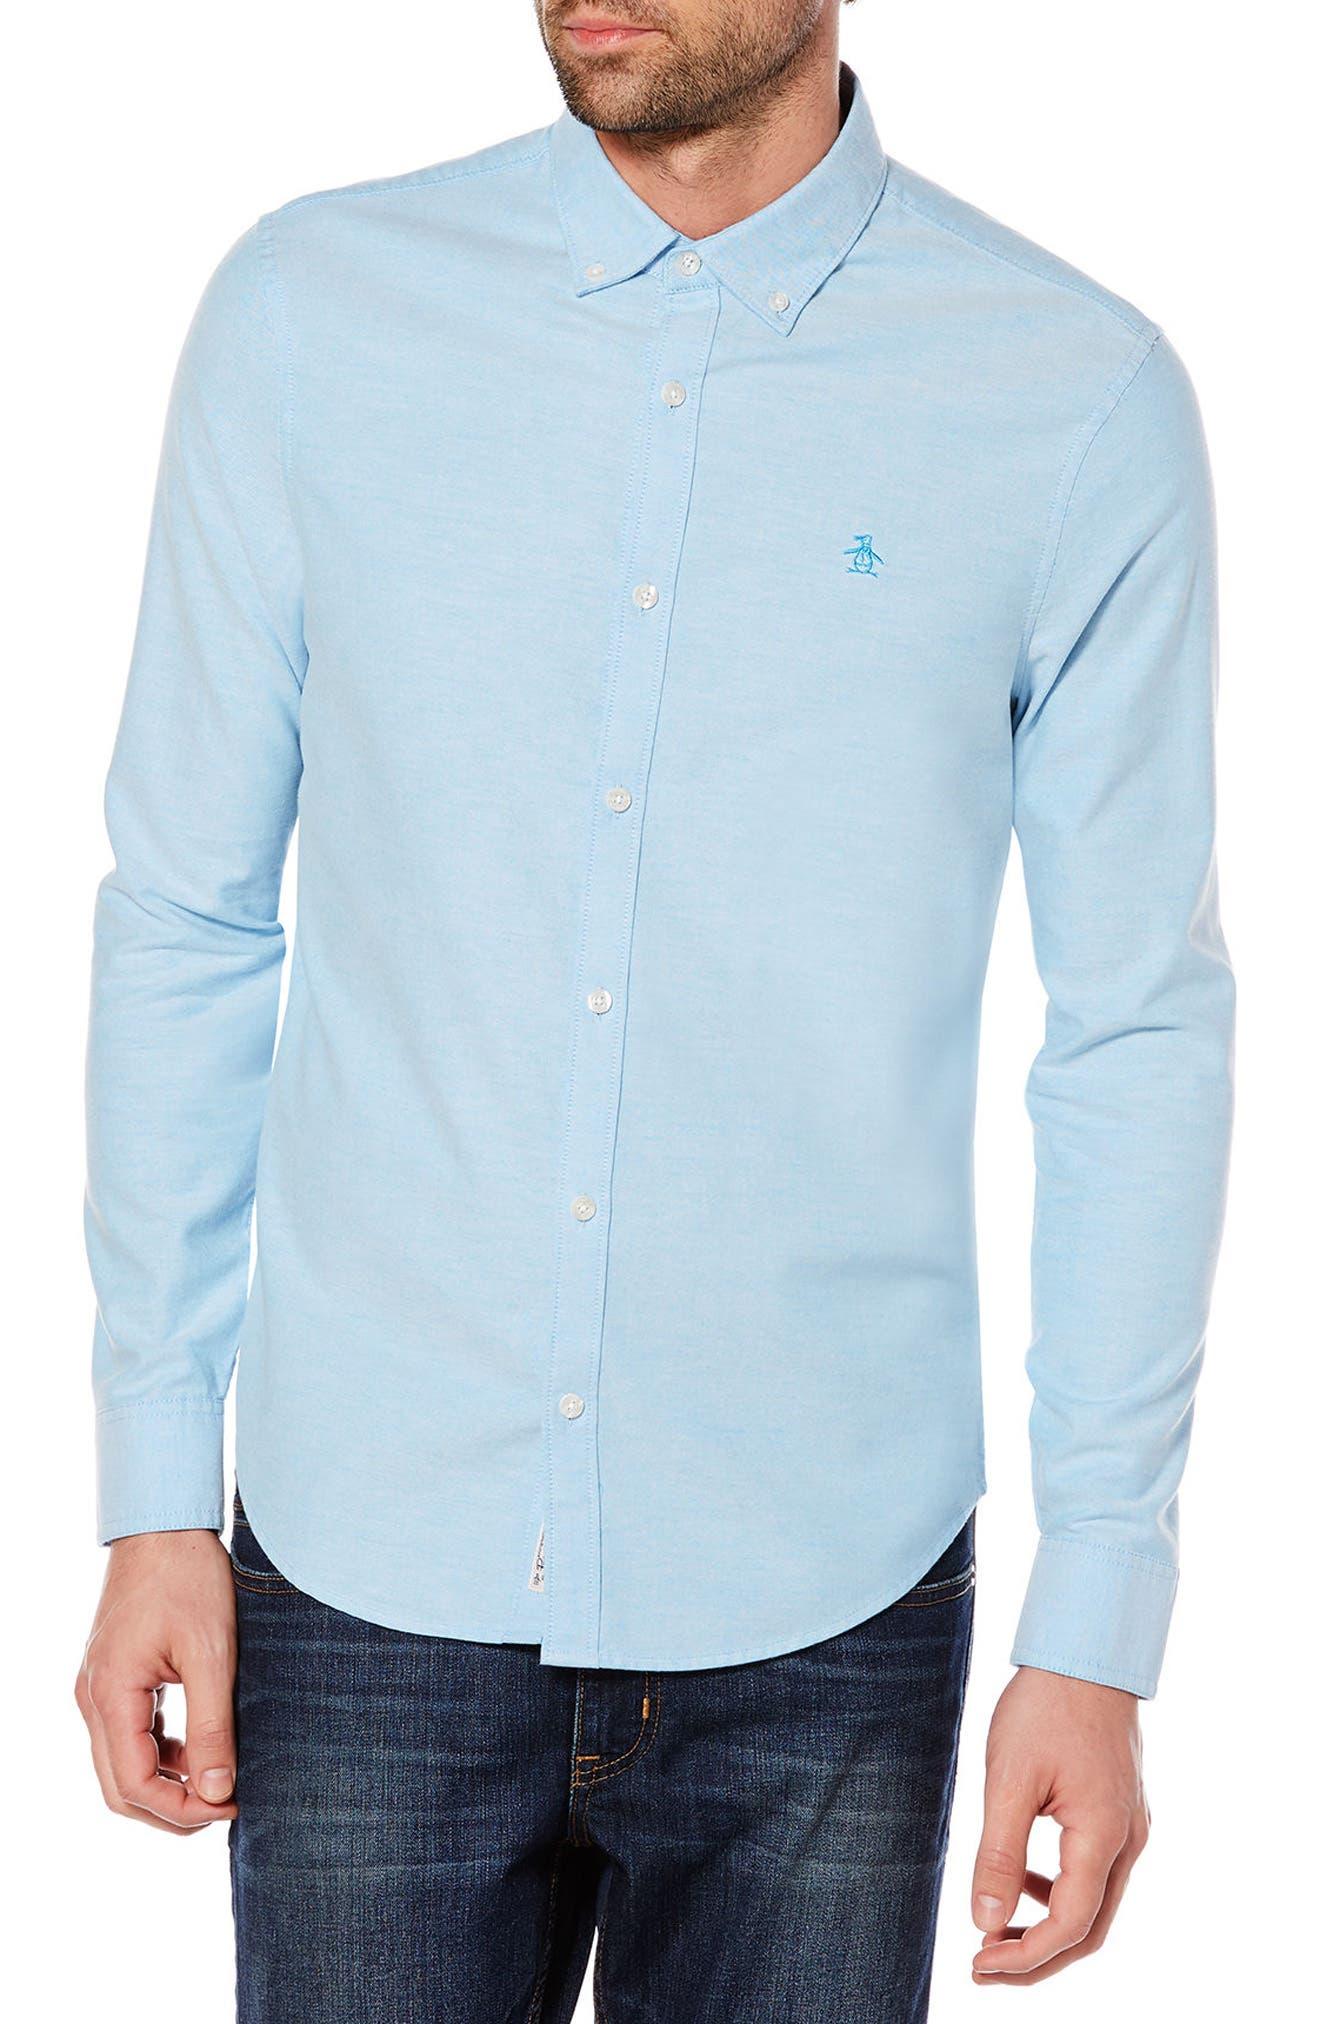 Heritage Slim Fit Oxford Shirt,                             Main thumbnail 1, color,                             418